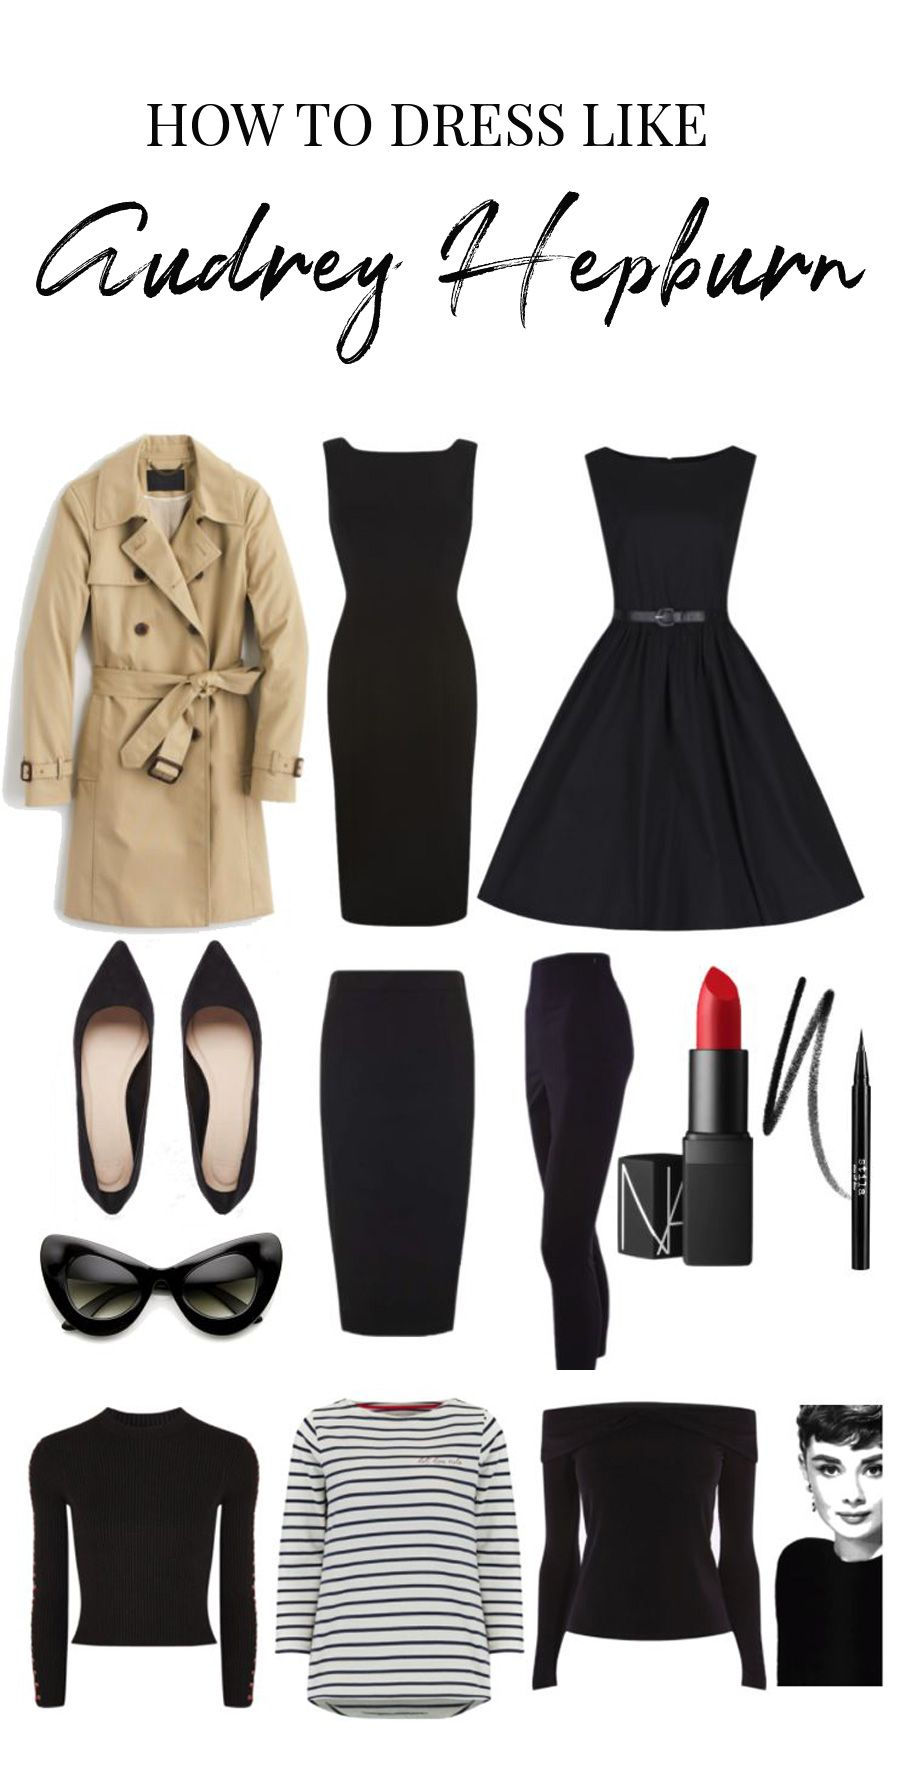 how to dress like audrey hepburn outfit ideas pinterest sch ne klamotten bekleidung und. Black Bedroom Furniture Sets. Home Design Ideas